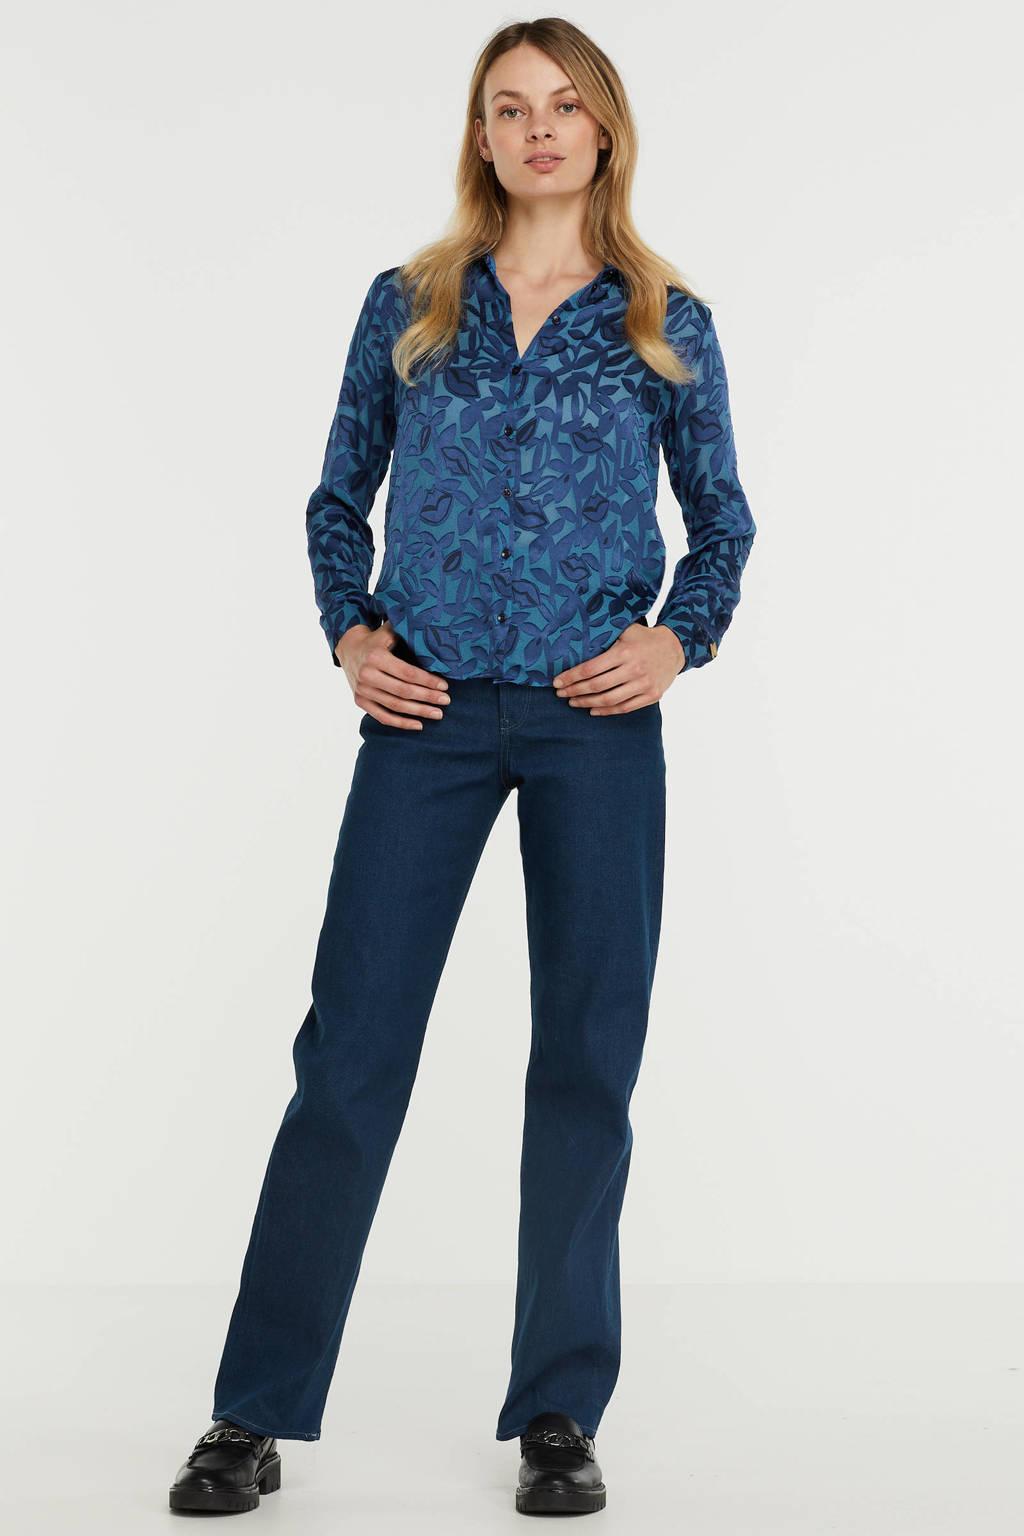 POM Amsterdam semi-transparante blouse Mila Kisses Silhouette Blue met all over print blauw, Blauw